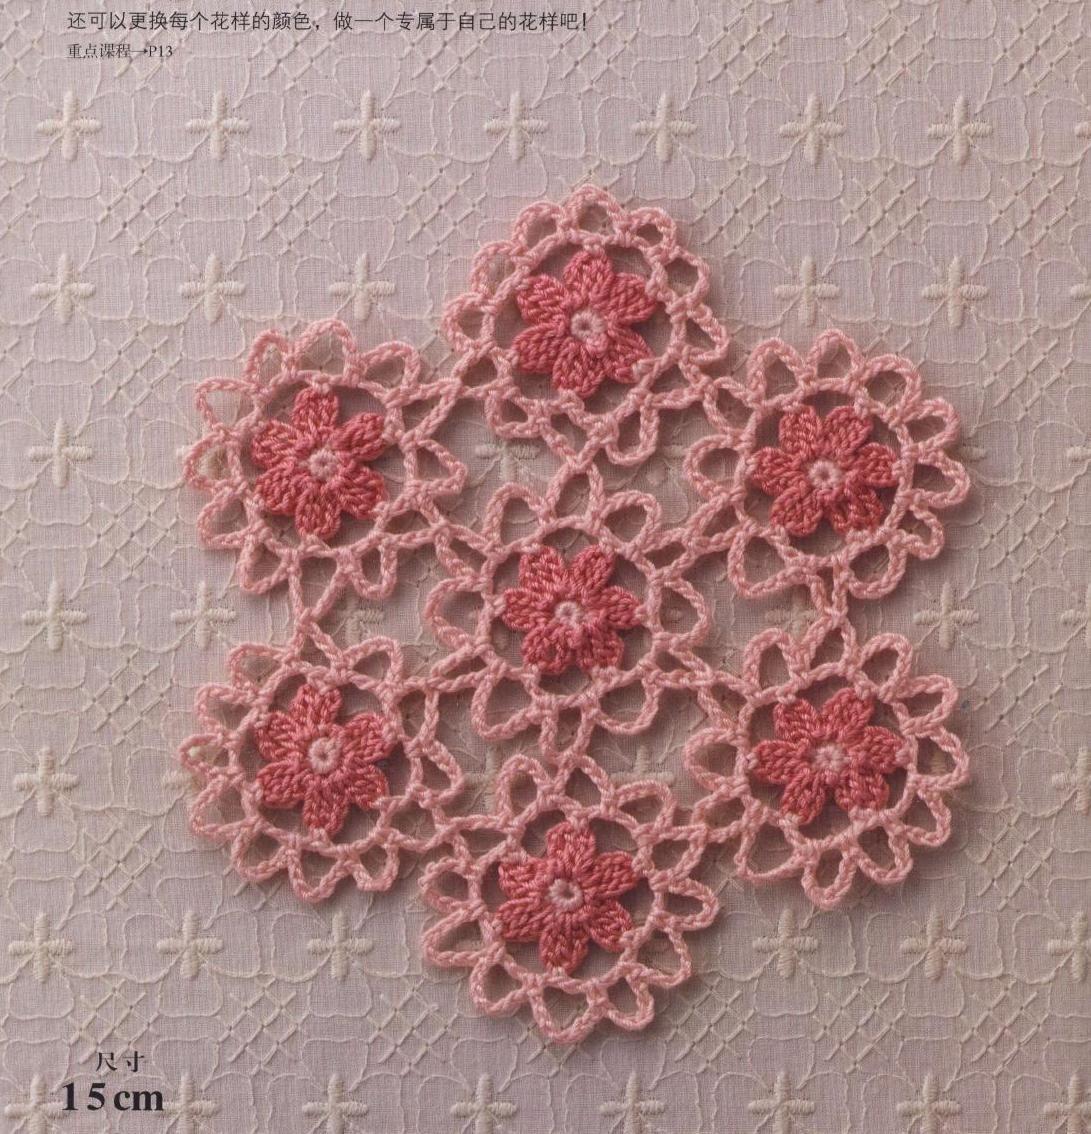 #ClippedOnIssuu from Crochet flower doily